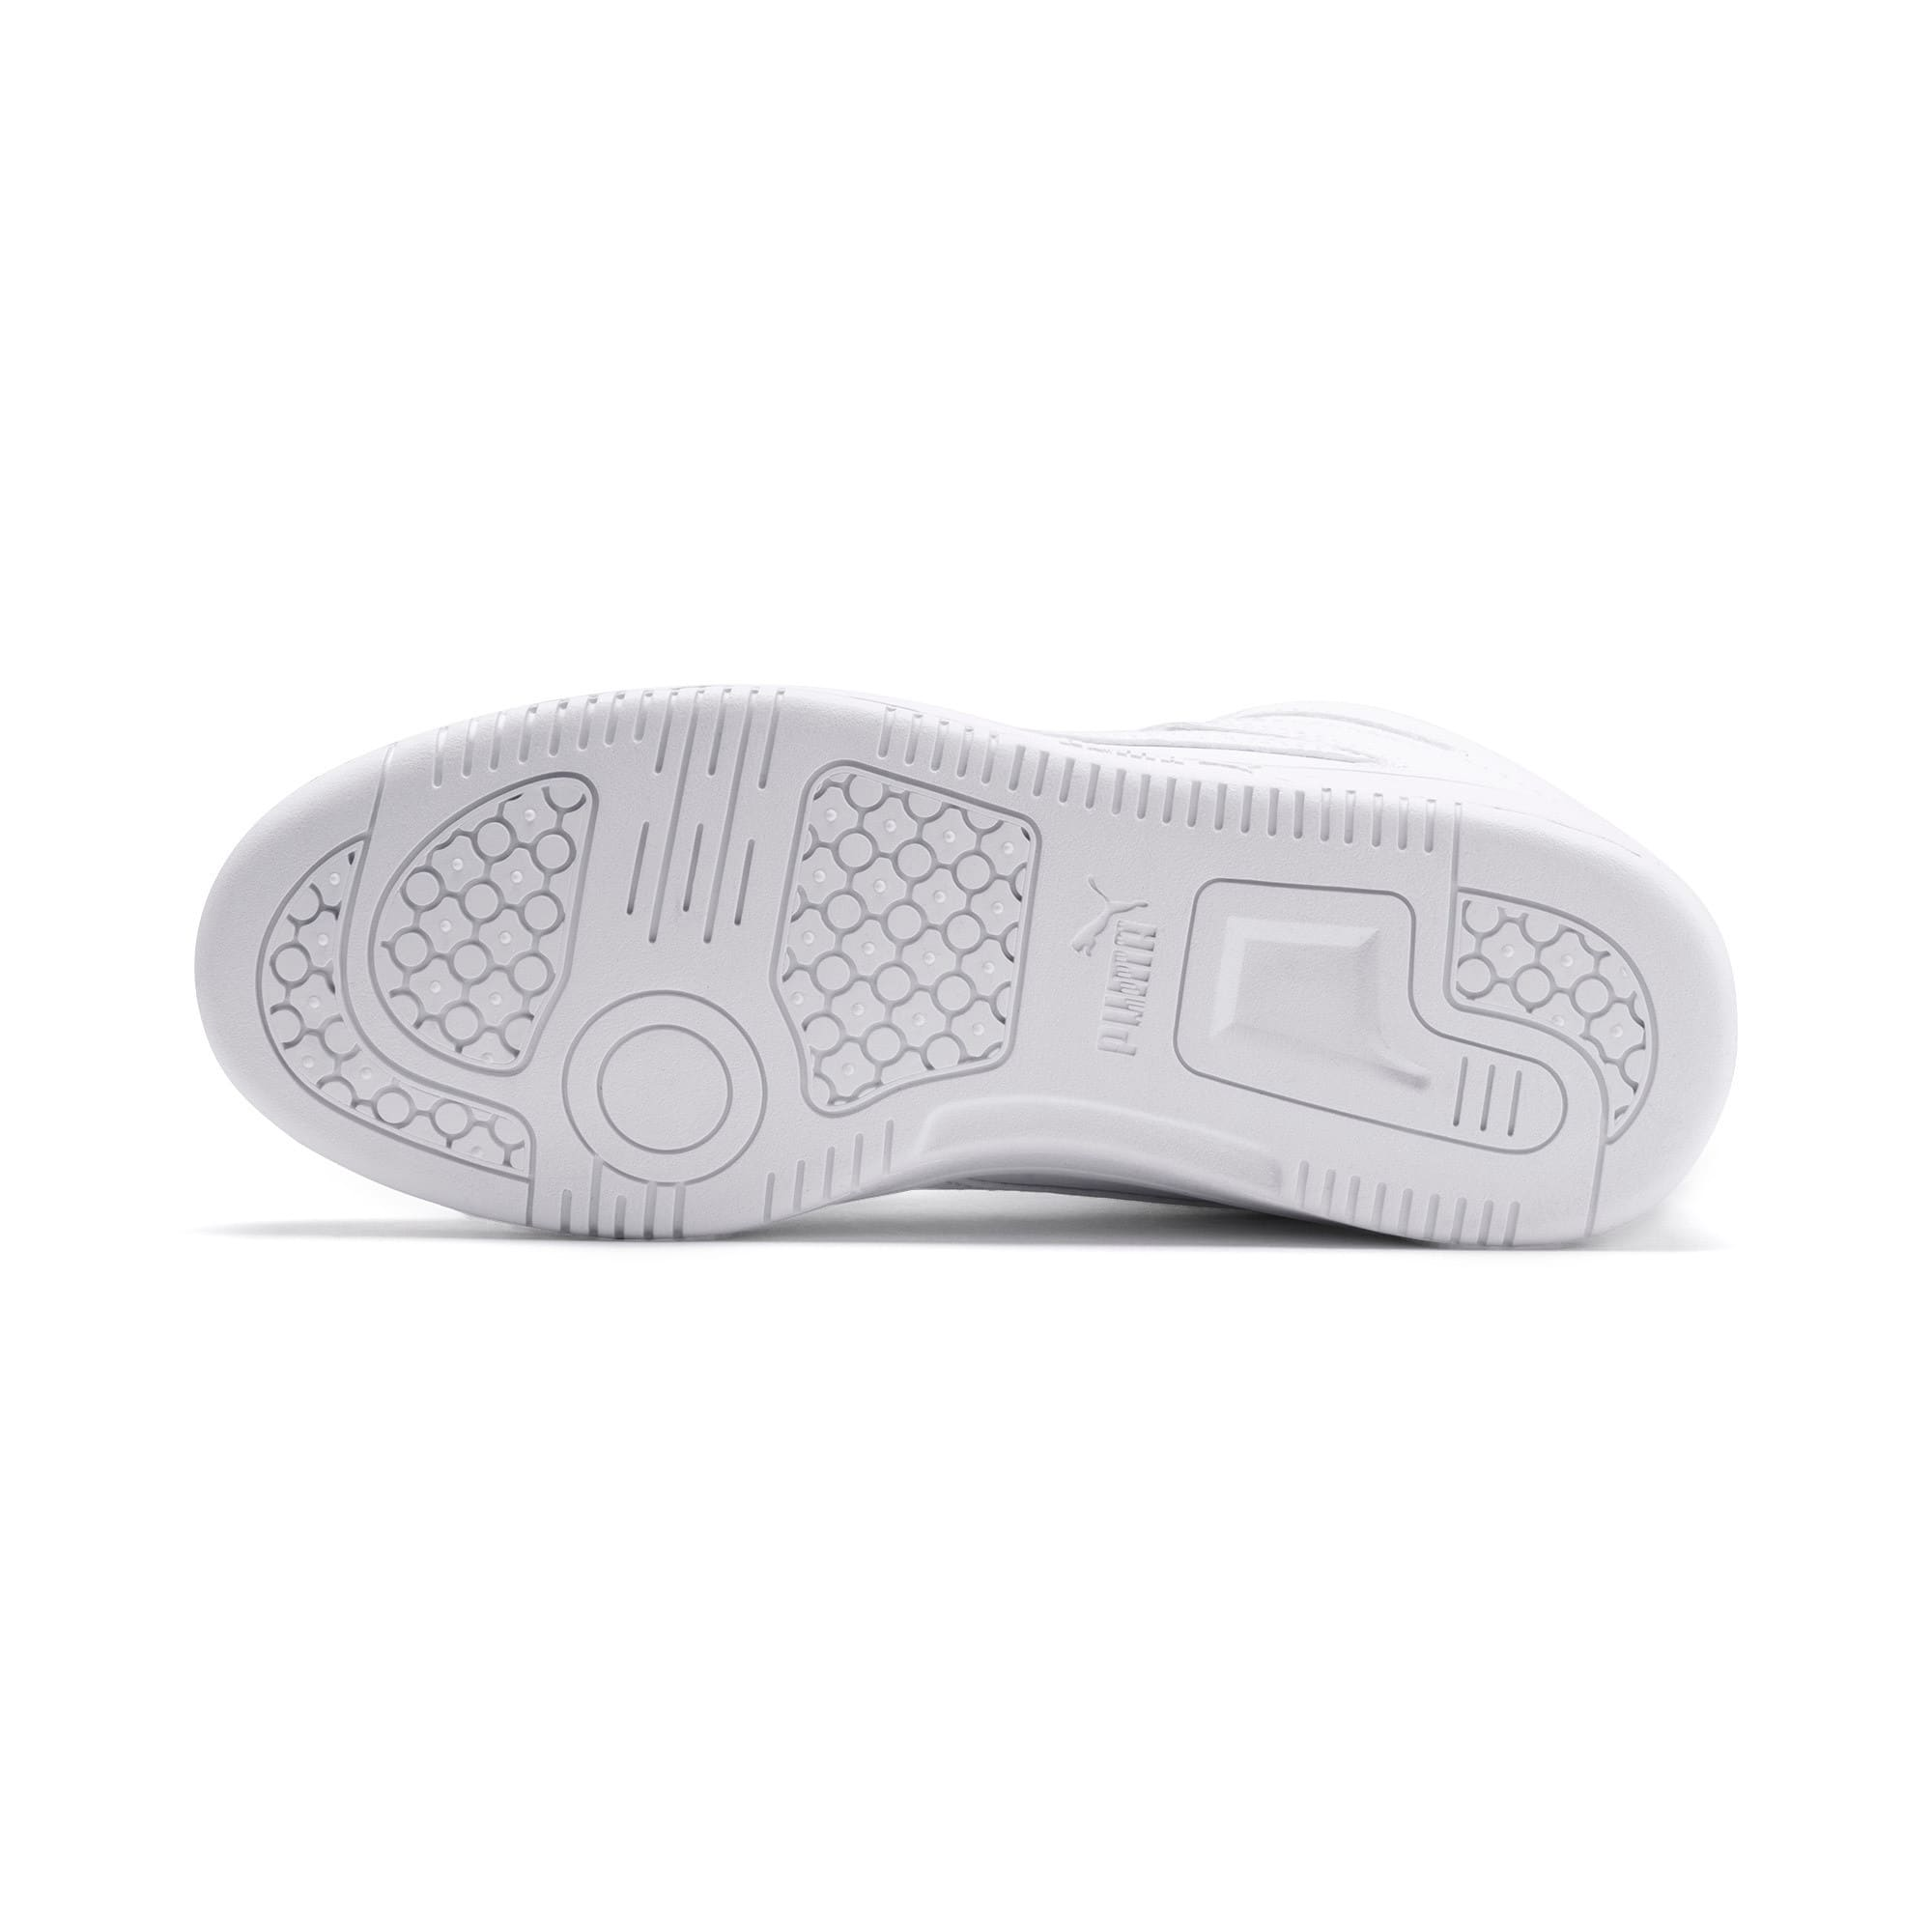 Thumbnail 4 of PUMA Rebound LayUp Mid Sneakers JR, Puma White-Gray Violet, medium